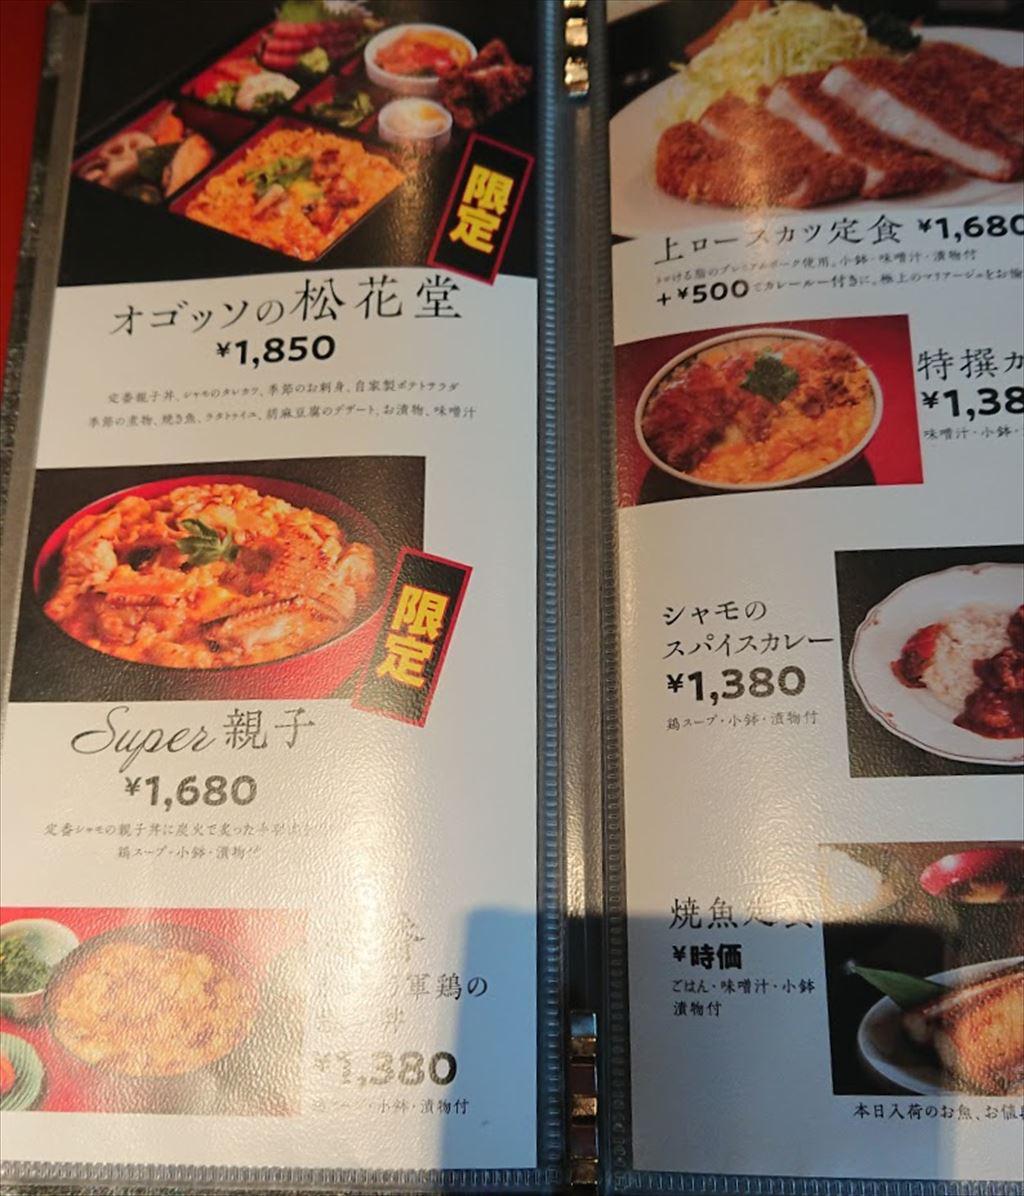 https://hayashida.jp/o/images2019-/DSC_0284_R.JPG